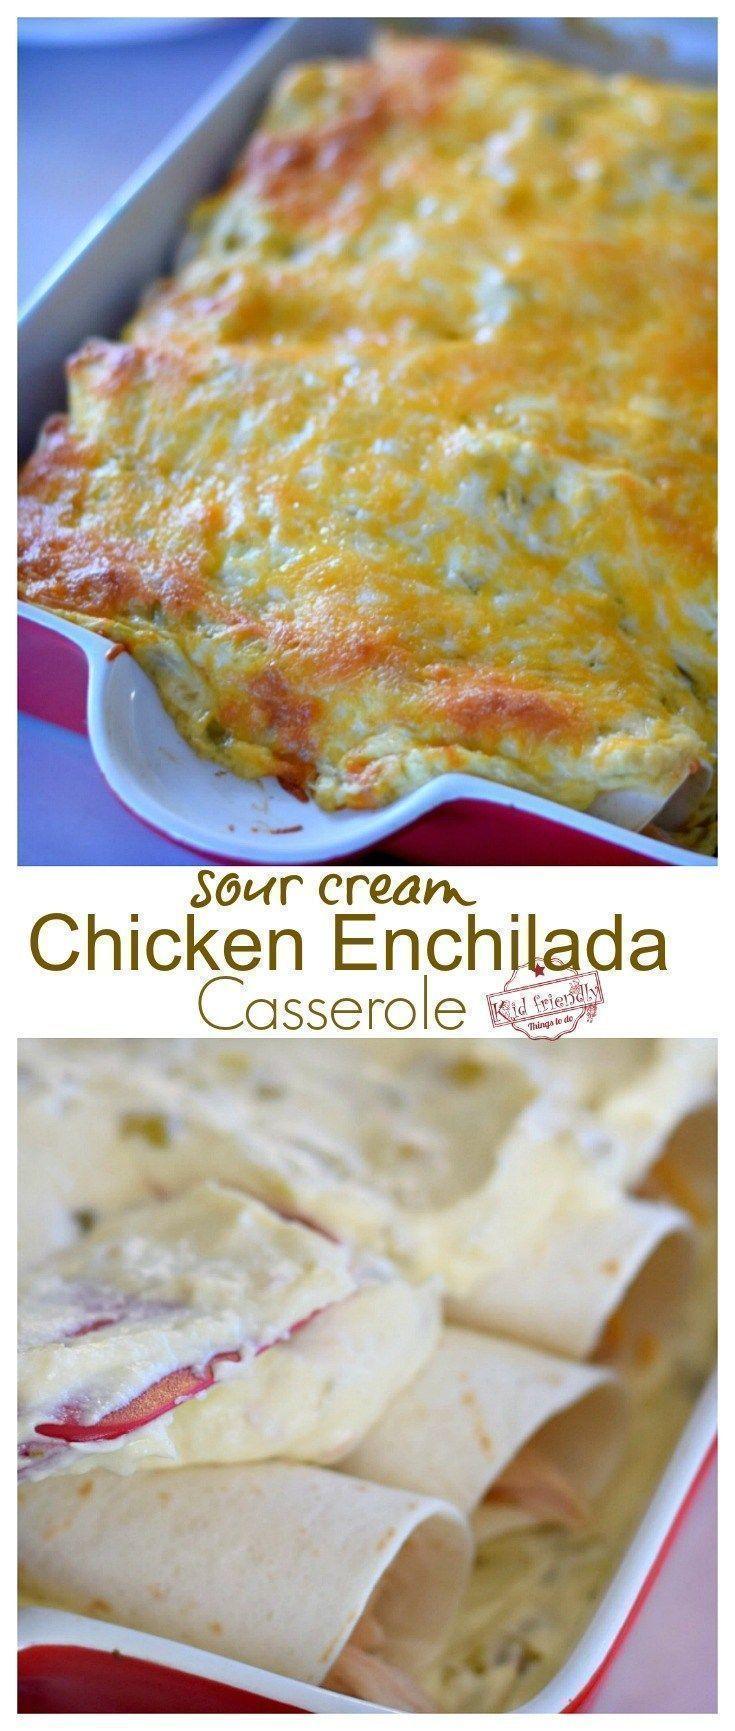 Easy Sour Cream Chicken Enchilada Casserole Recipe Enchilada Casserole Recipes Chicken Enchilada Casserole Recipe Chicken Enchilada Casserole